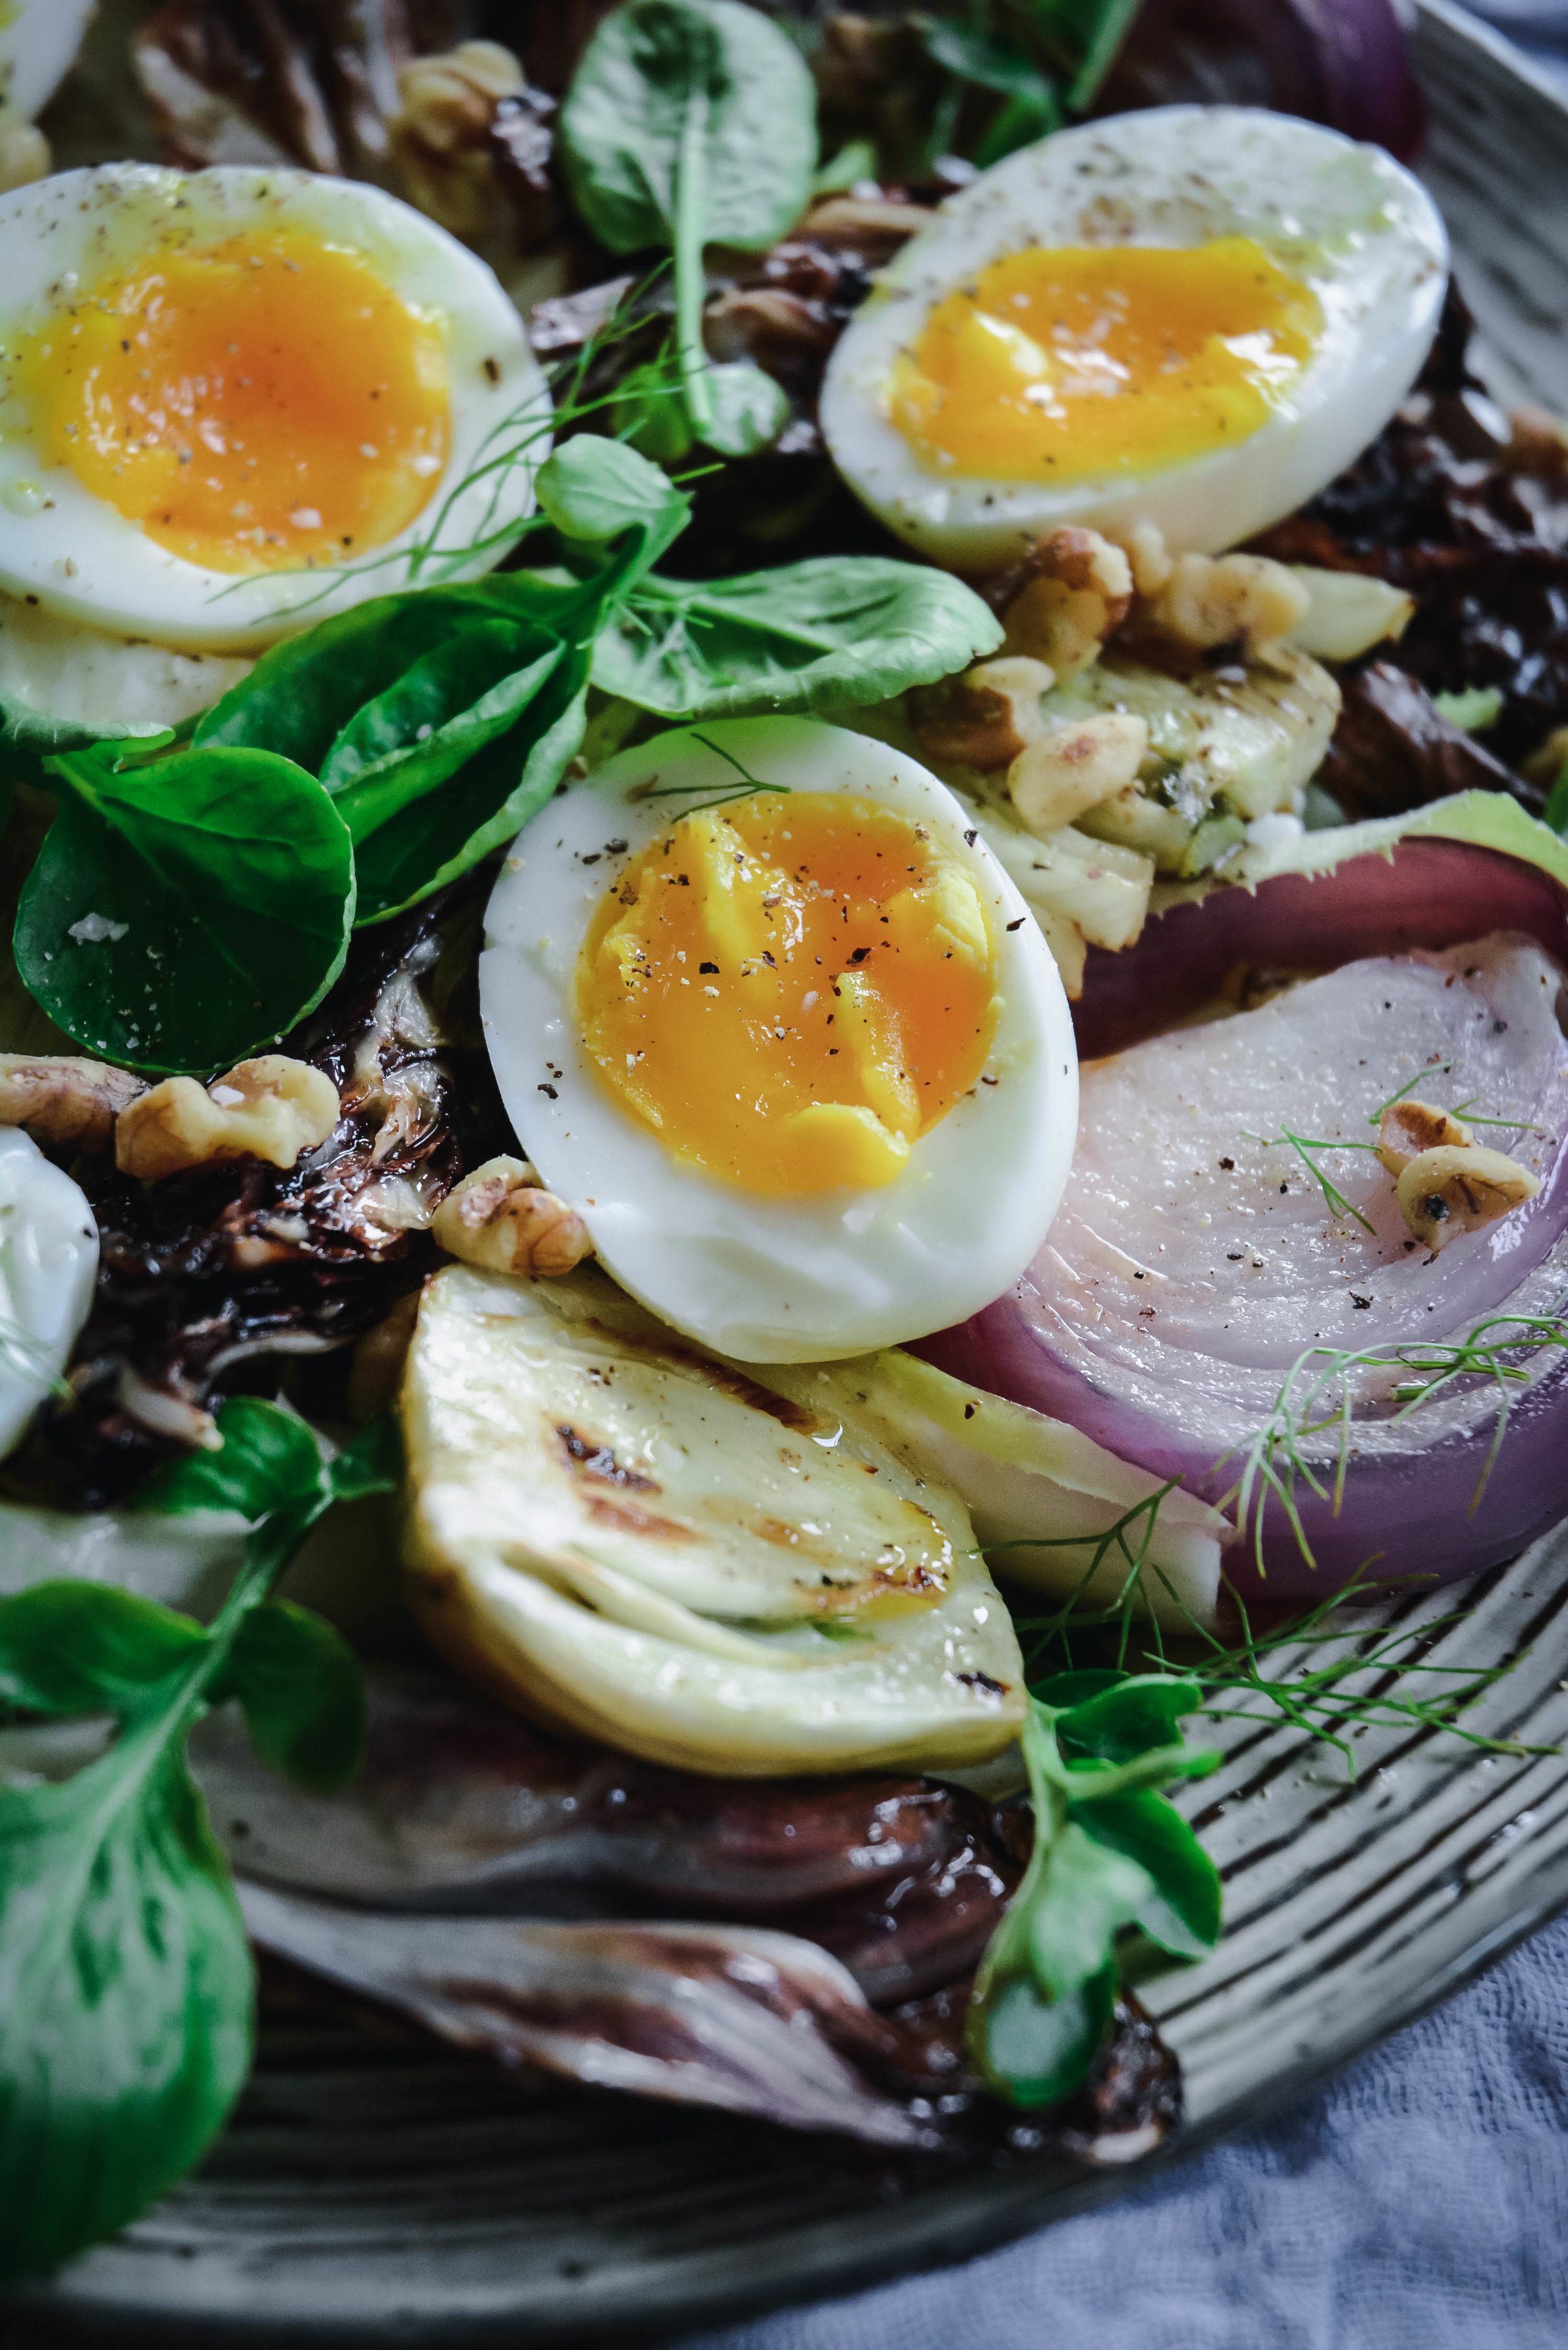 Soft boiled eggs on salad